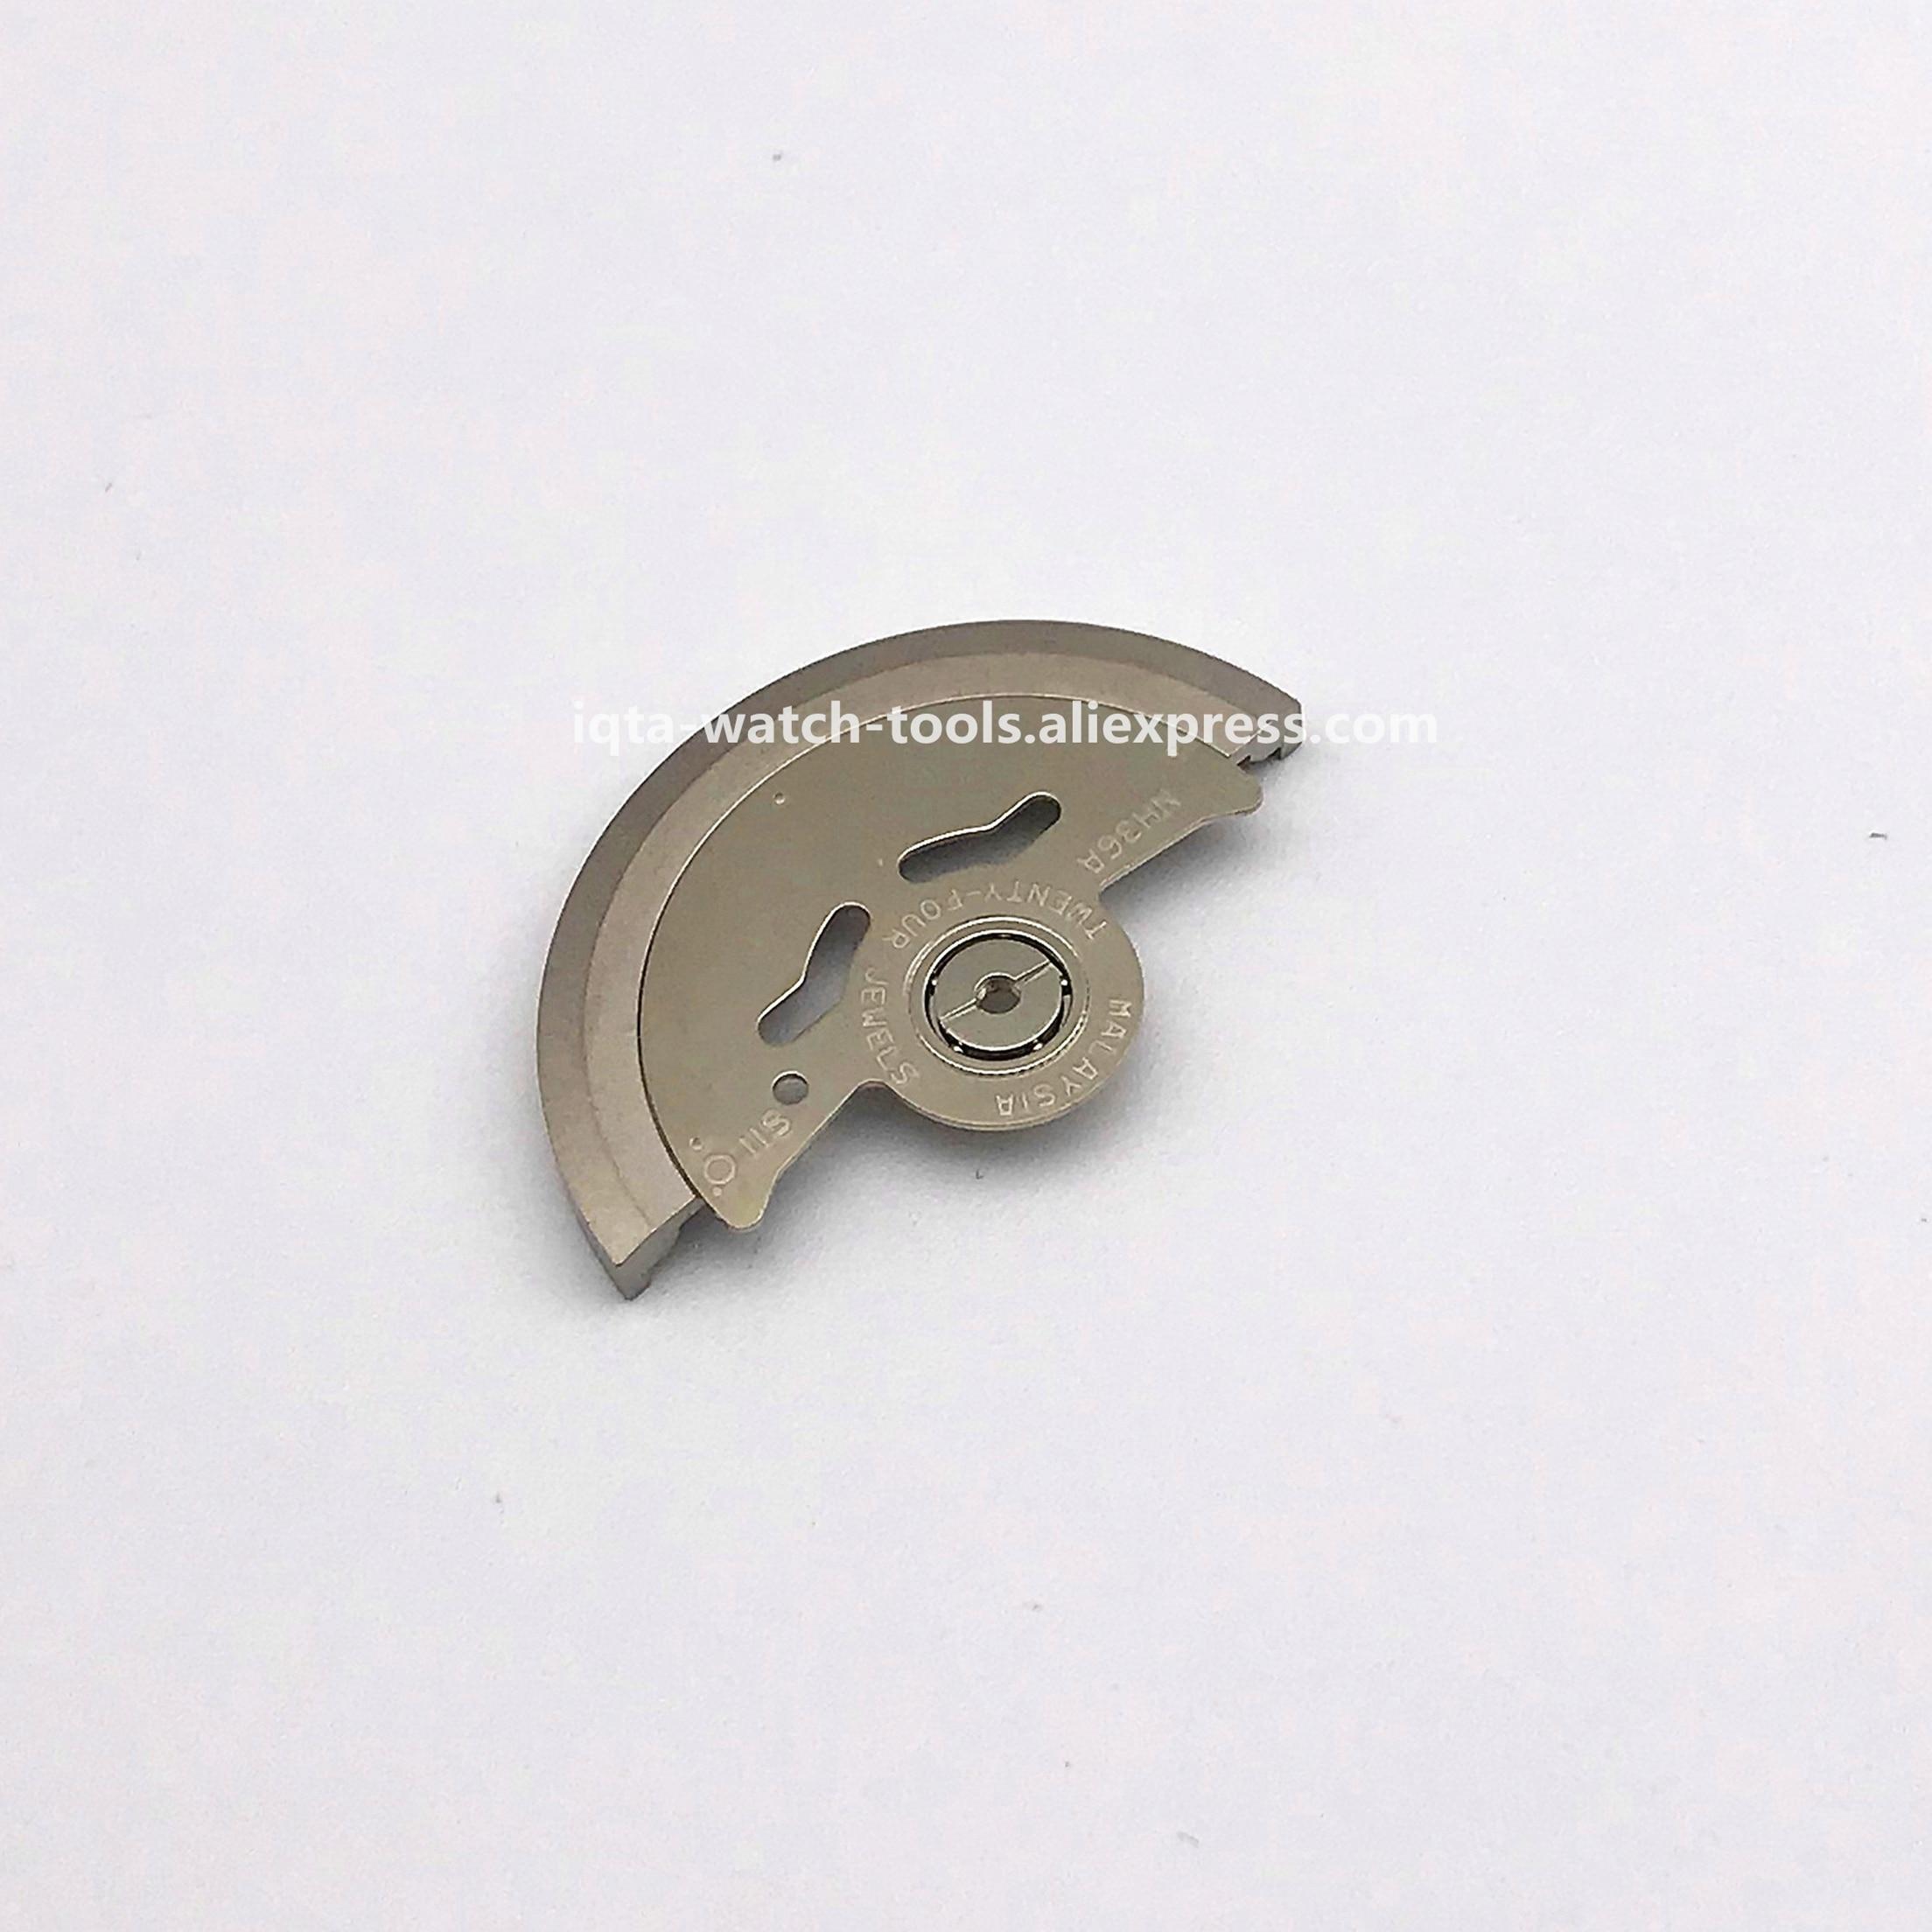 Automatic Hammer Tudor Movement Rotor Oscillating Weight Fit For ETA 2824 2836